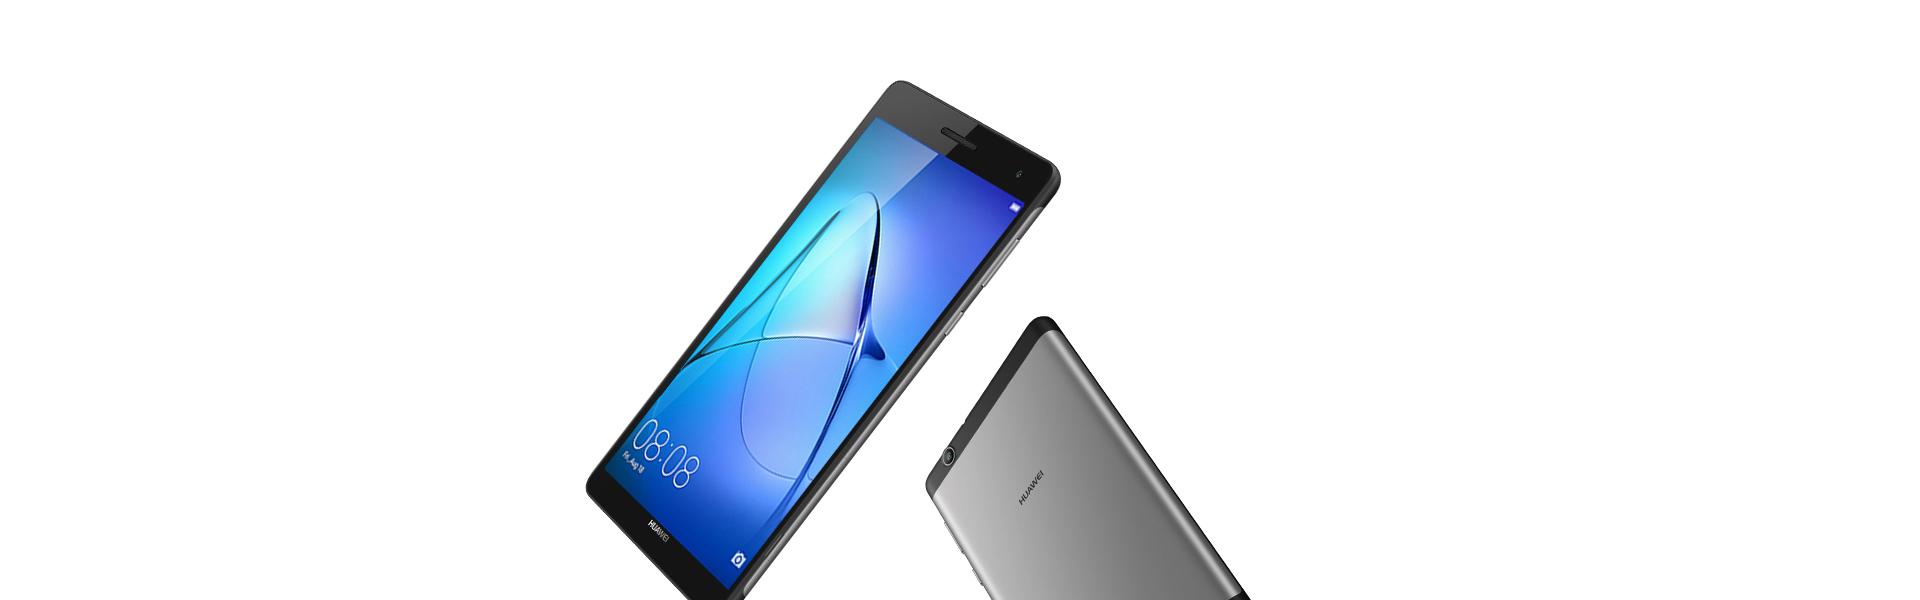 HUAWEI MediaPad T3 7 inch display, parental control, 3G